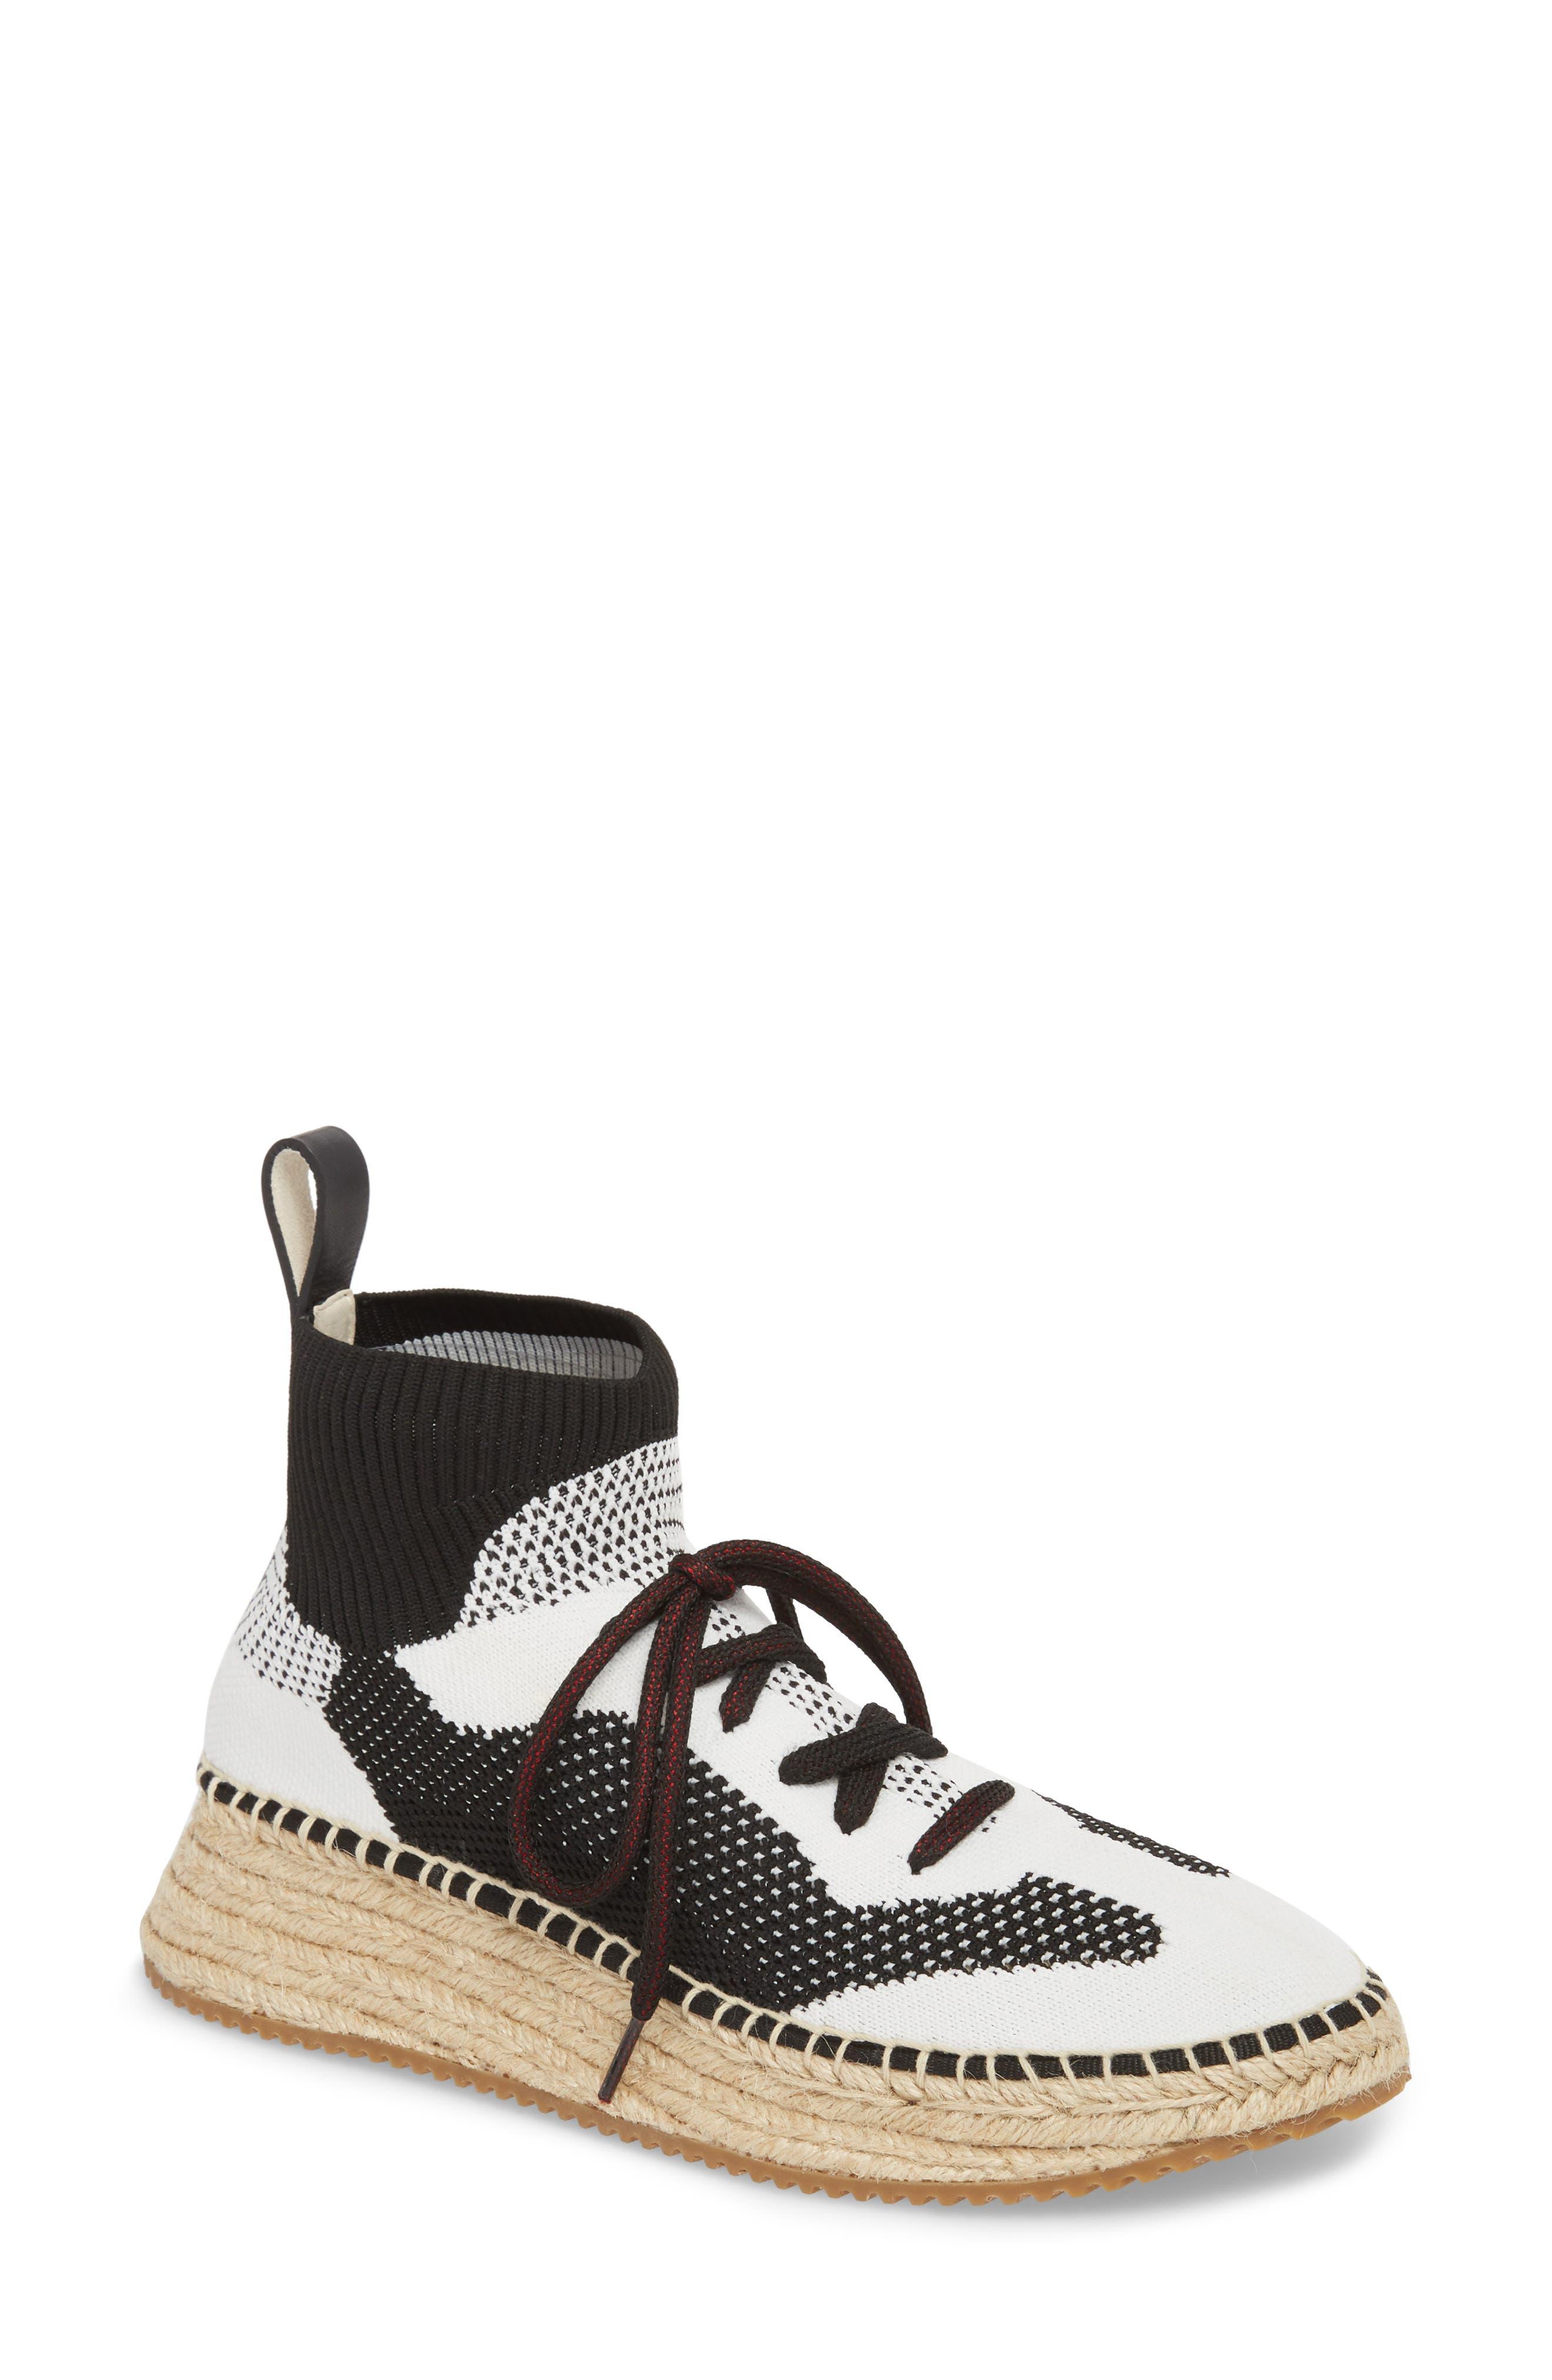 Dakota Espadrille Sock Sneaker,                             Main thumbnail 1, color,                             002